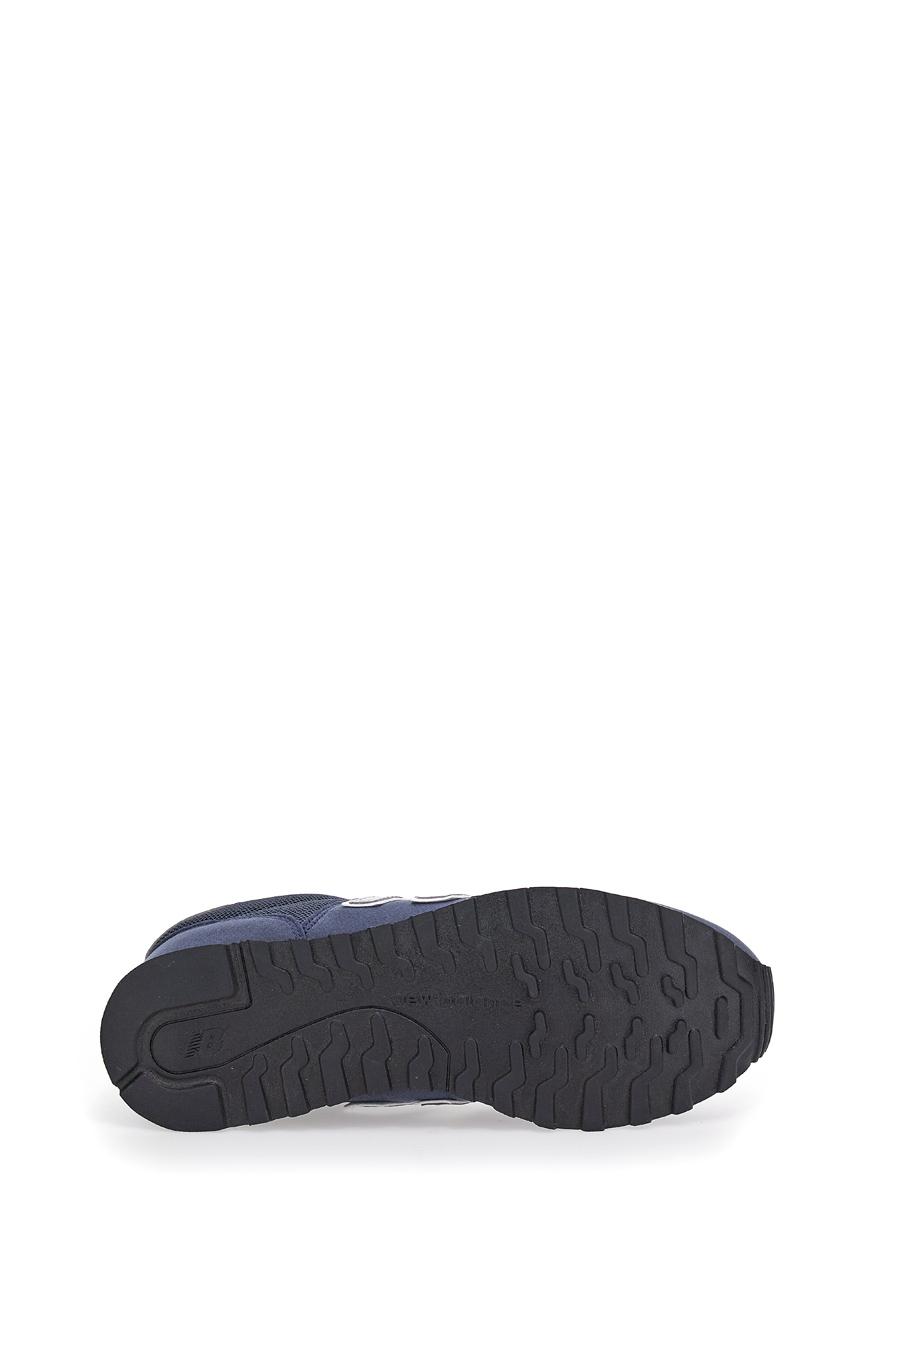 SNEAKERS uomo blu NEW BALANCE 500NAY | Pittarello